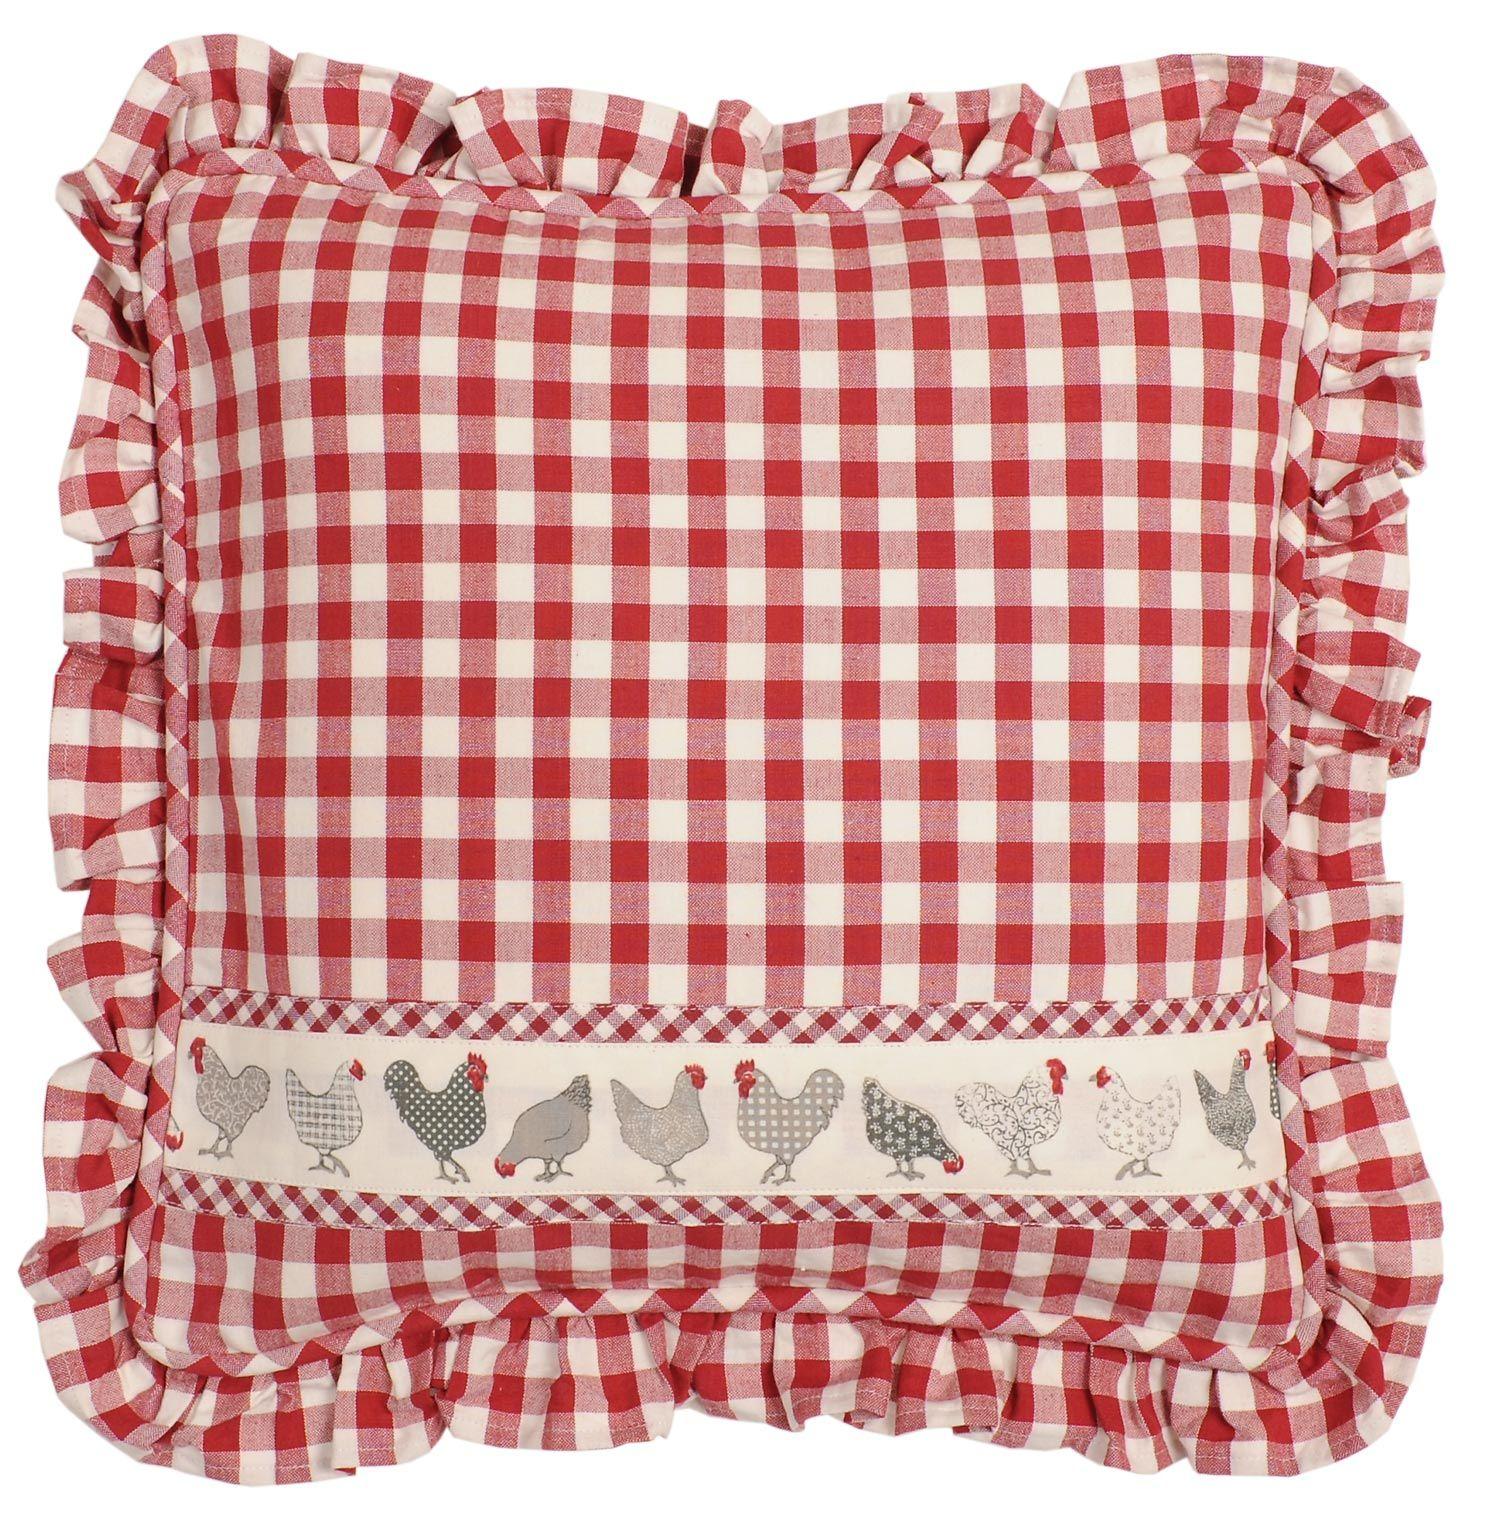 Cushion 40 40 Check Red Cena 400 Kc Nakupujte Na Www Almara Shop Cz Yastiklar Dekoratif Yastiklar Ve Kanaviceler